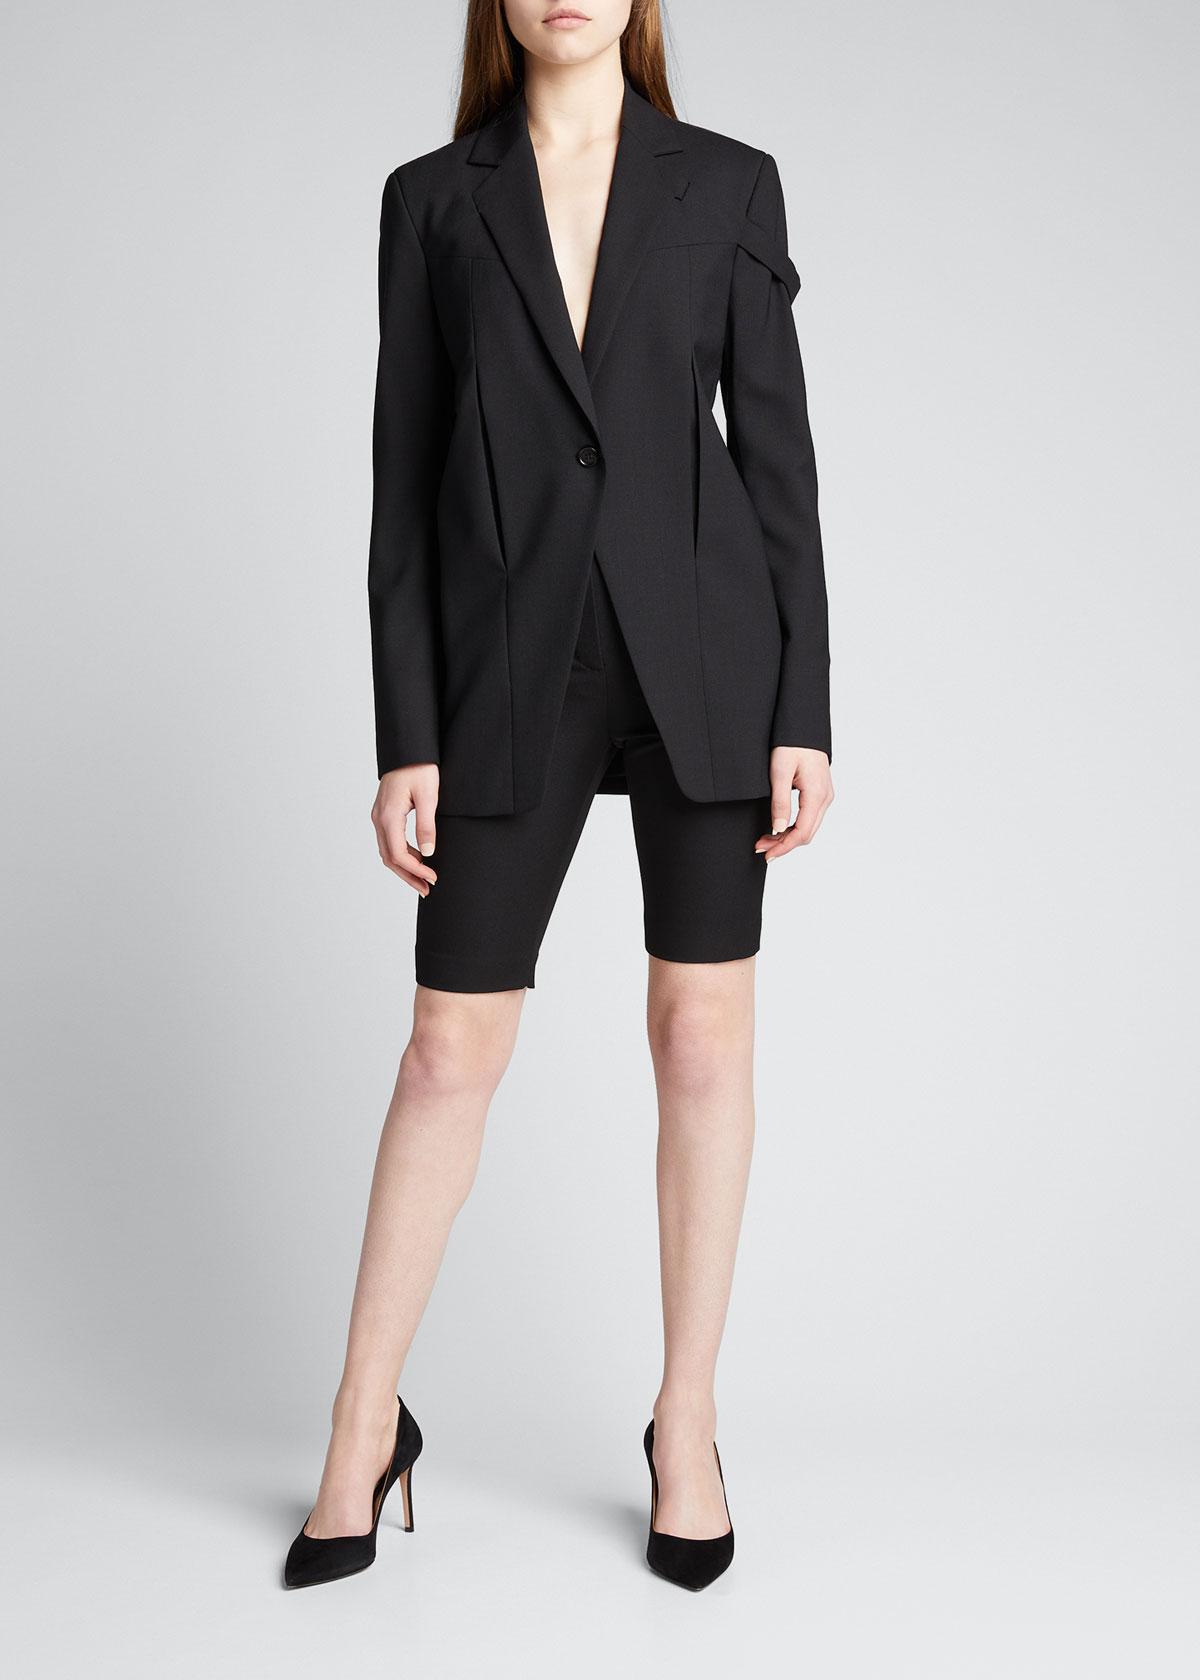 Balmain High-Rise Wool Bike Shorts  - female - BLACK - Size: 34 FR (2 US)